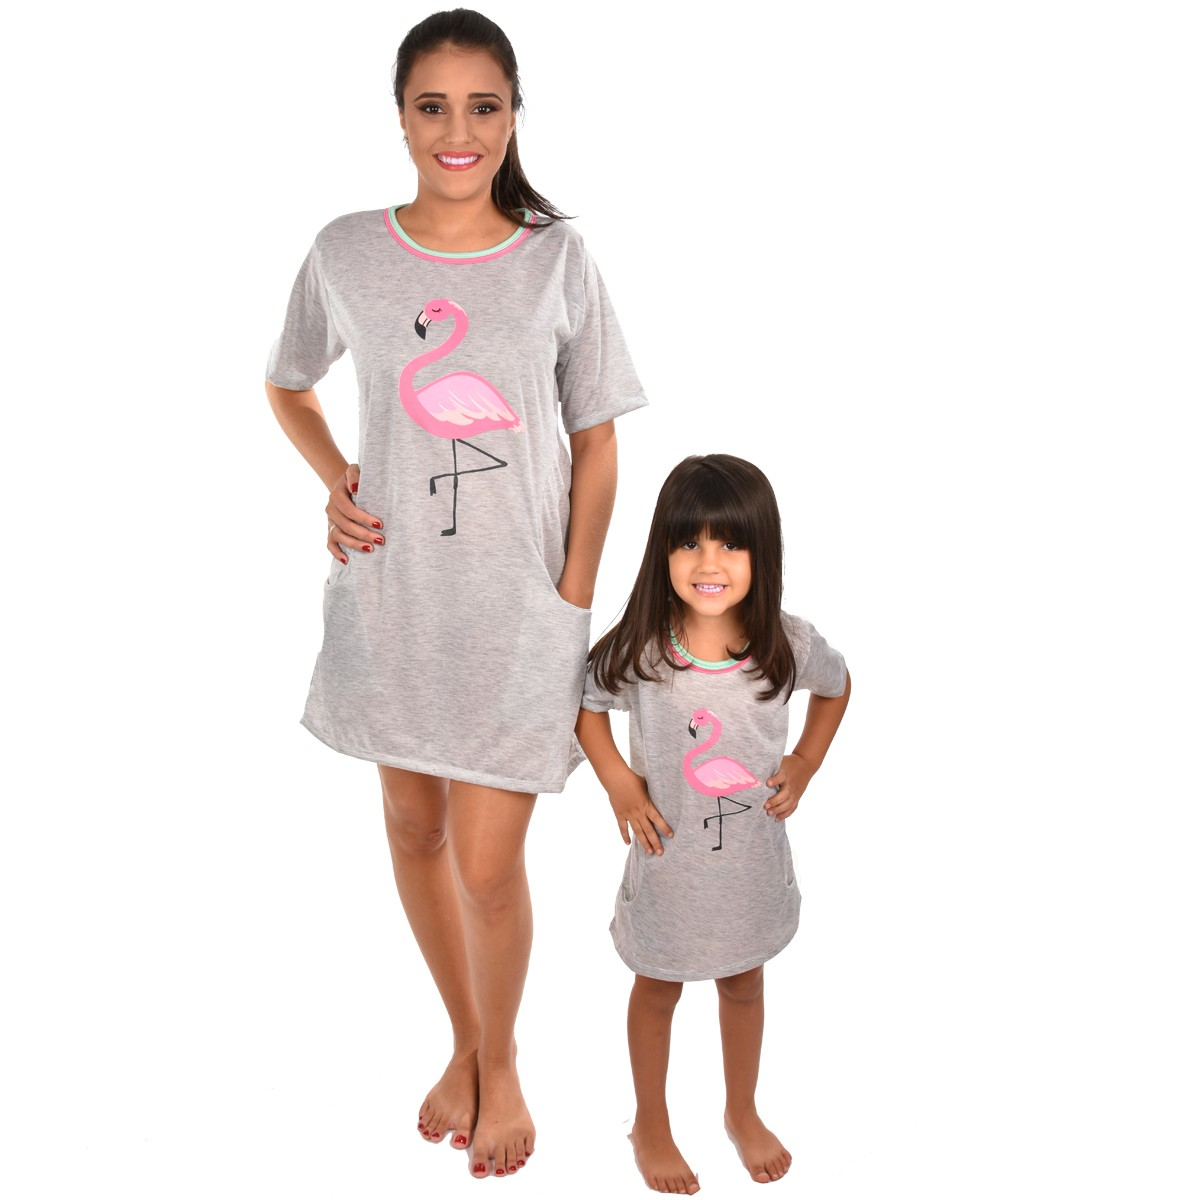 Camisola Camisão Meia Manga Flamingo Adulto Feminino 365